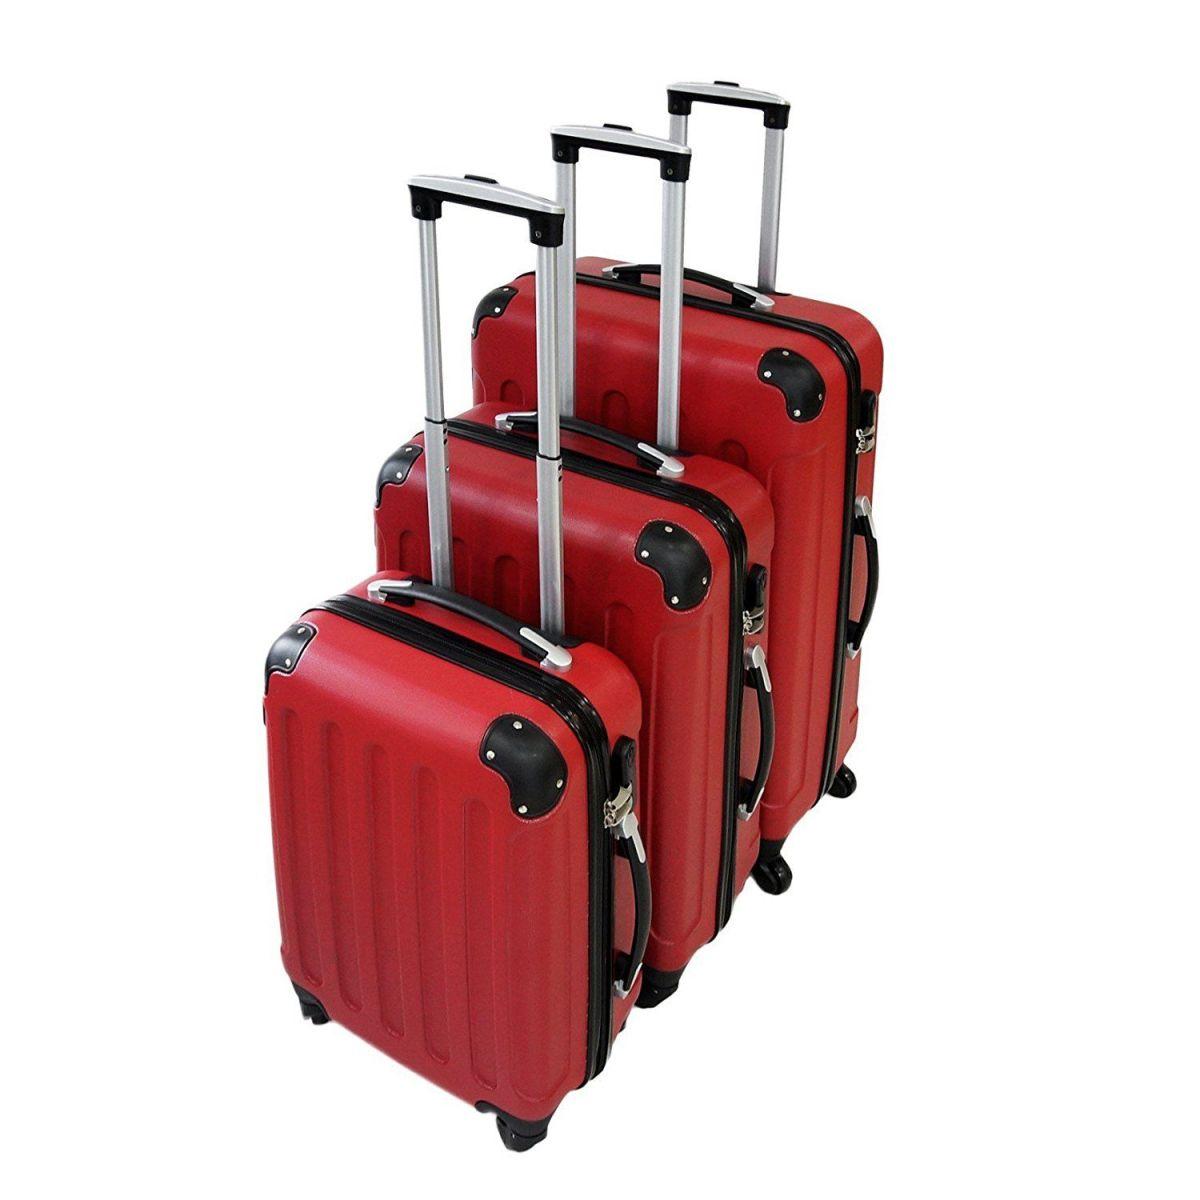 Set de 3 maletas trolley Todeco, maletas sólidas con ruedas. Análisis detallado.